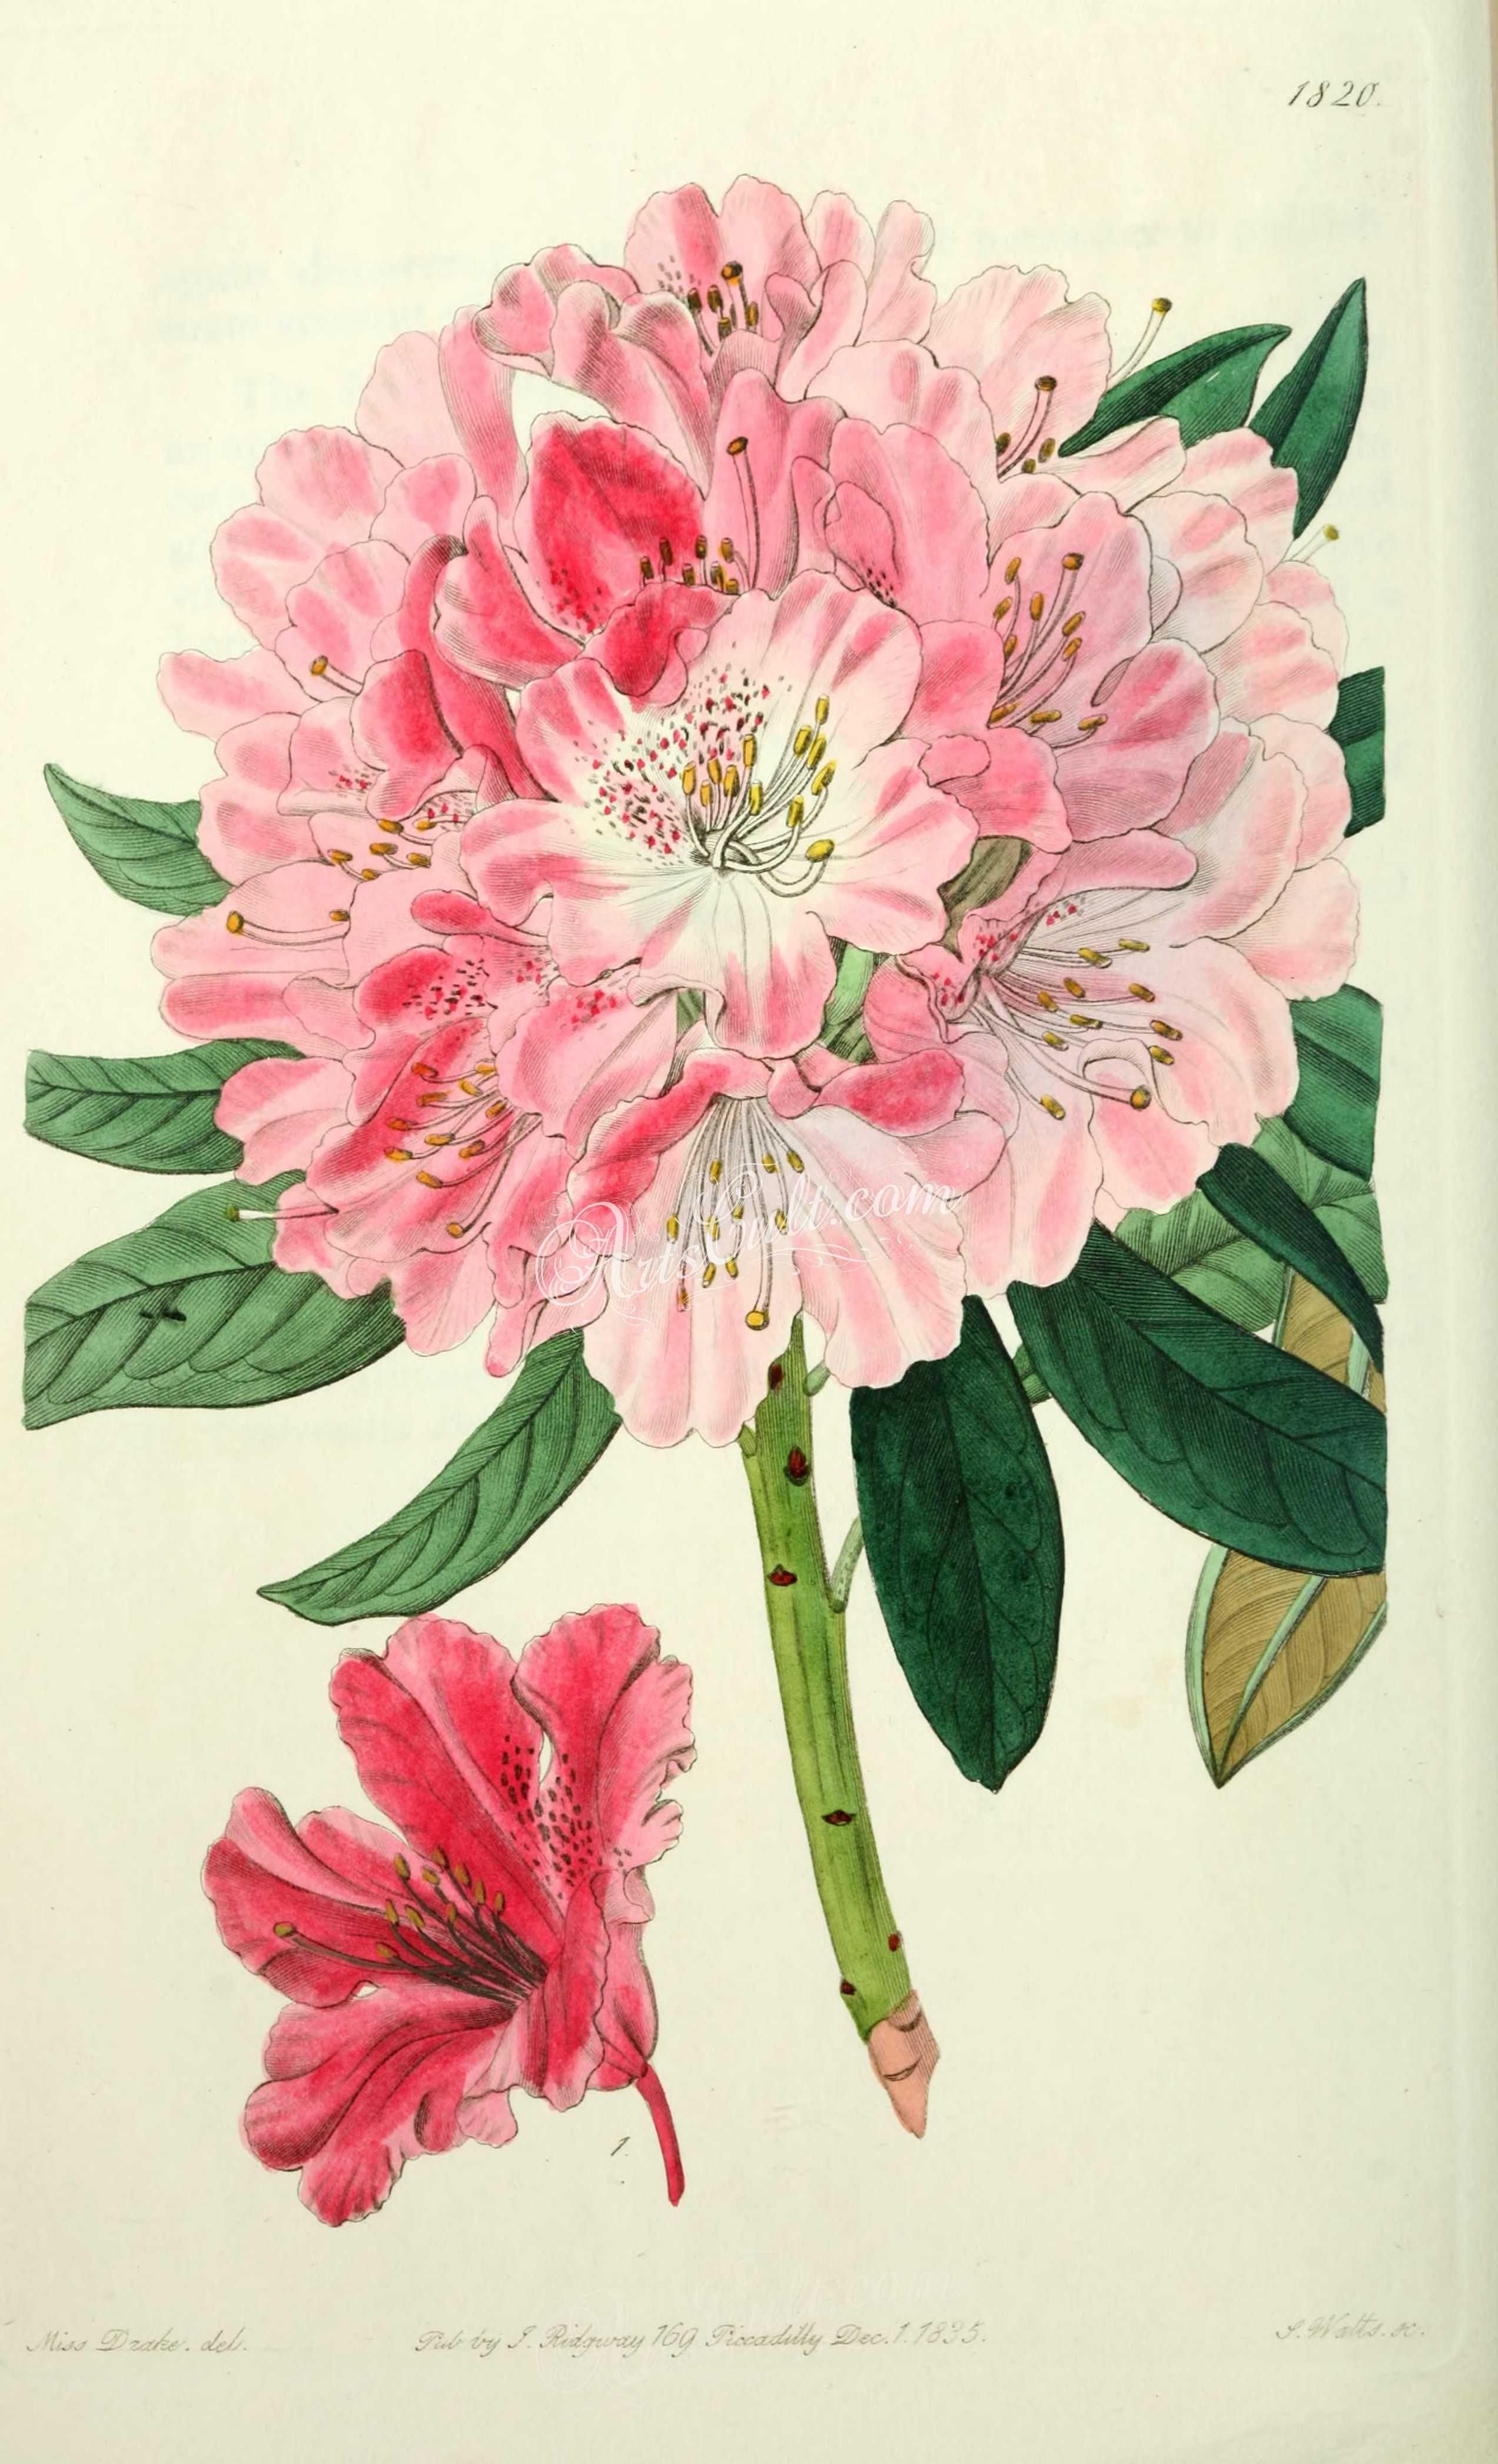 Flowers 21492  1820 Rhododendron Pulcherrimum, Lovely Rhododendron [2545X4187]